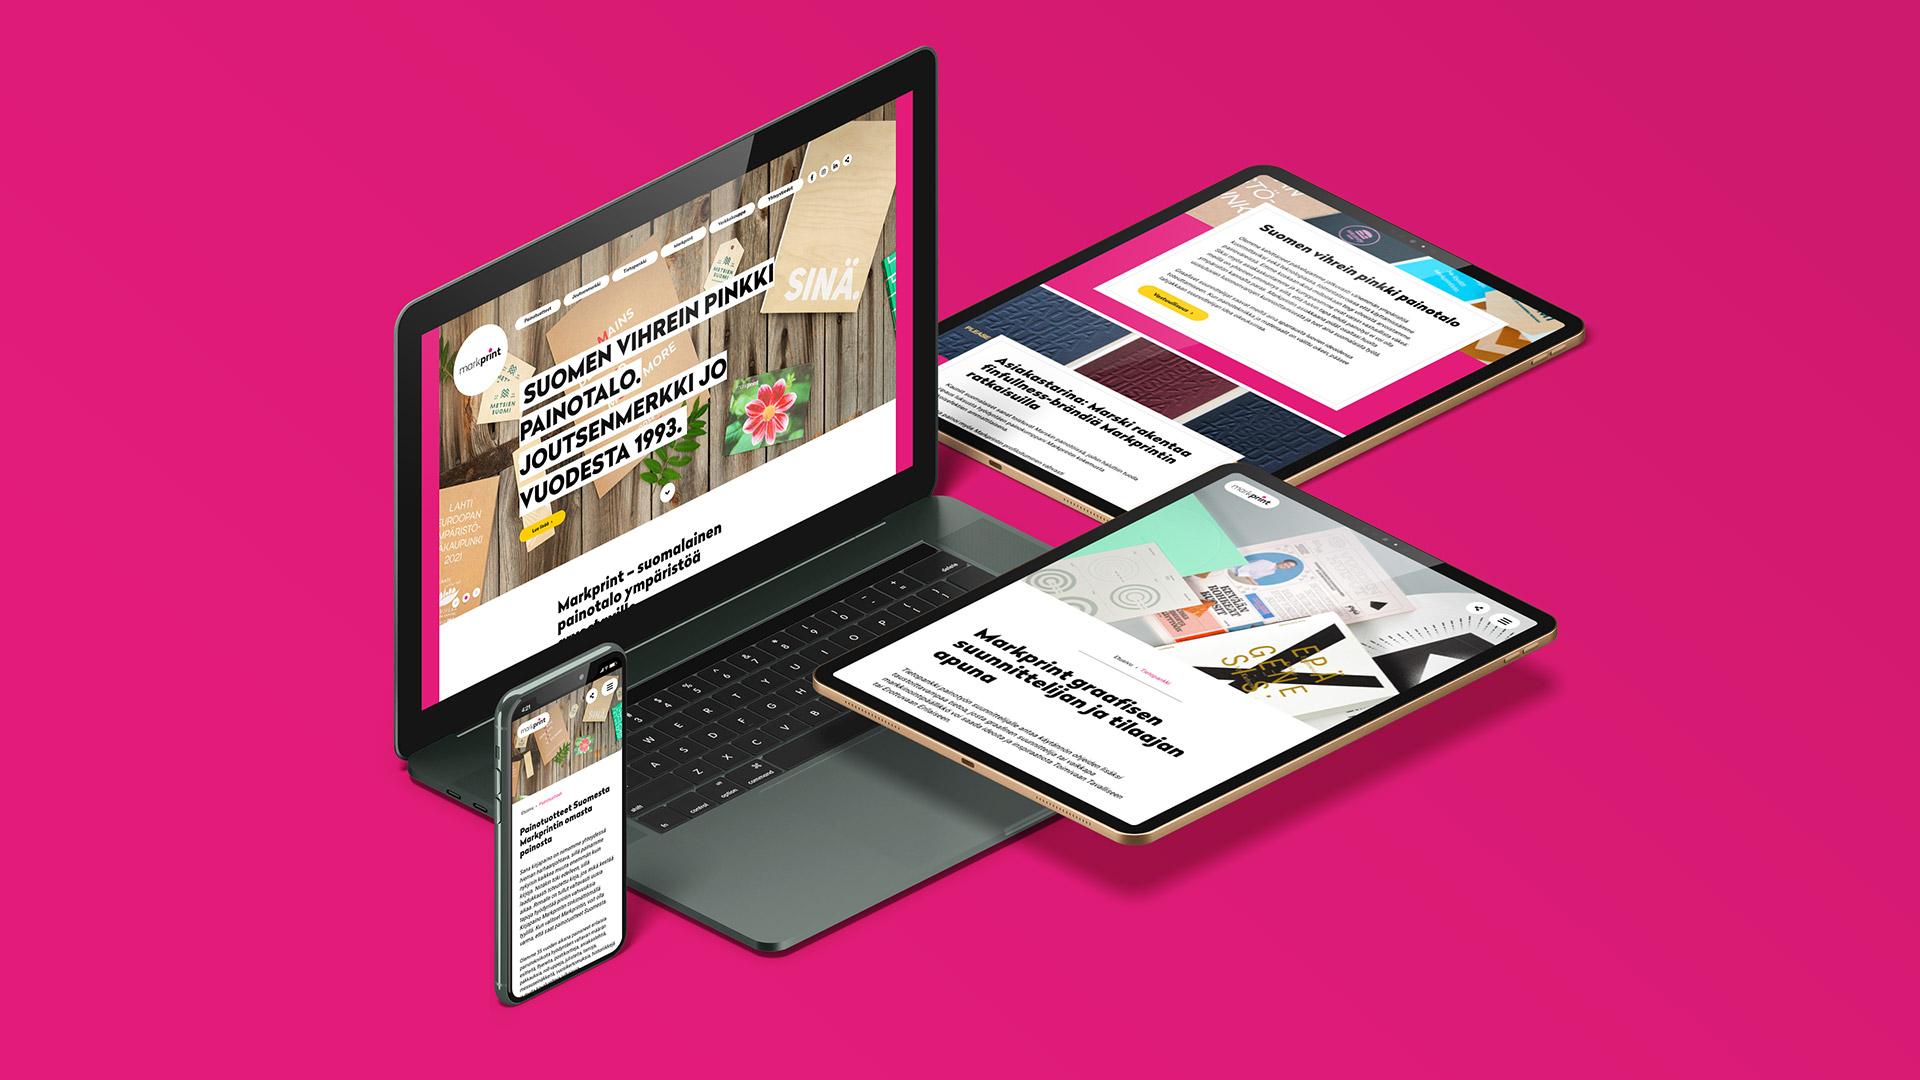 markprint-verkkosivu-mockup1.jpg